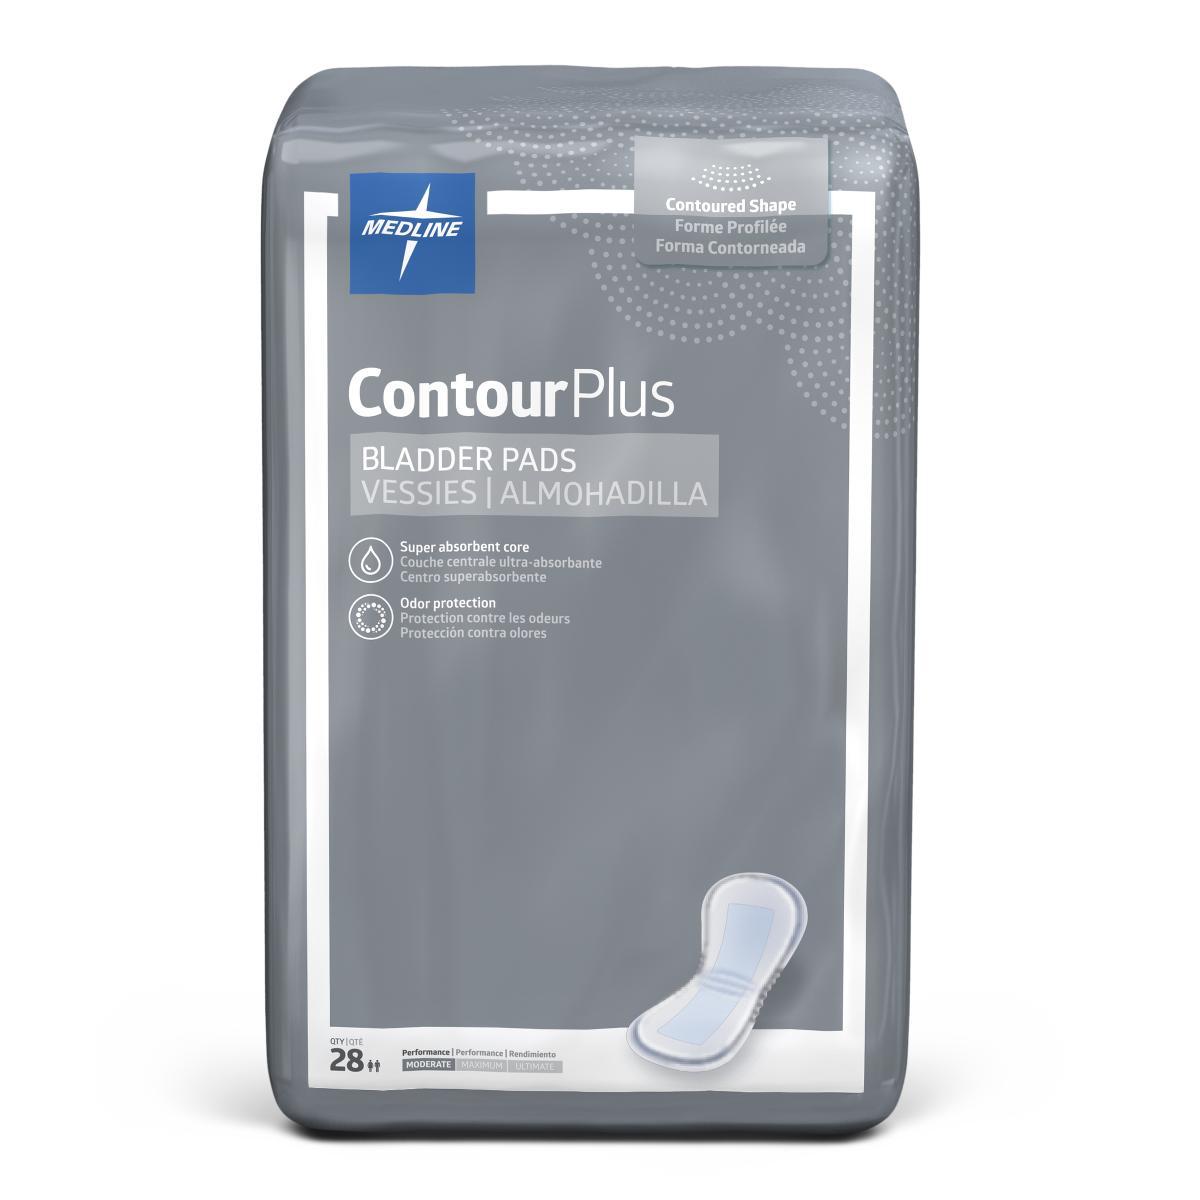 "Capri Plus Bladder Control Pads,5.5"" X 10.5"" 28 Count (Pack of 12)"